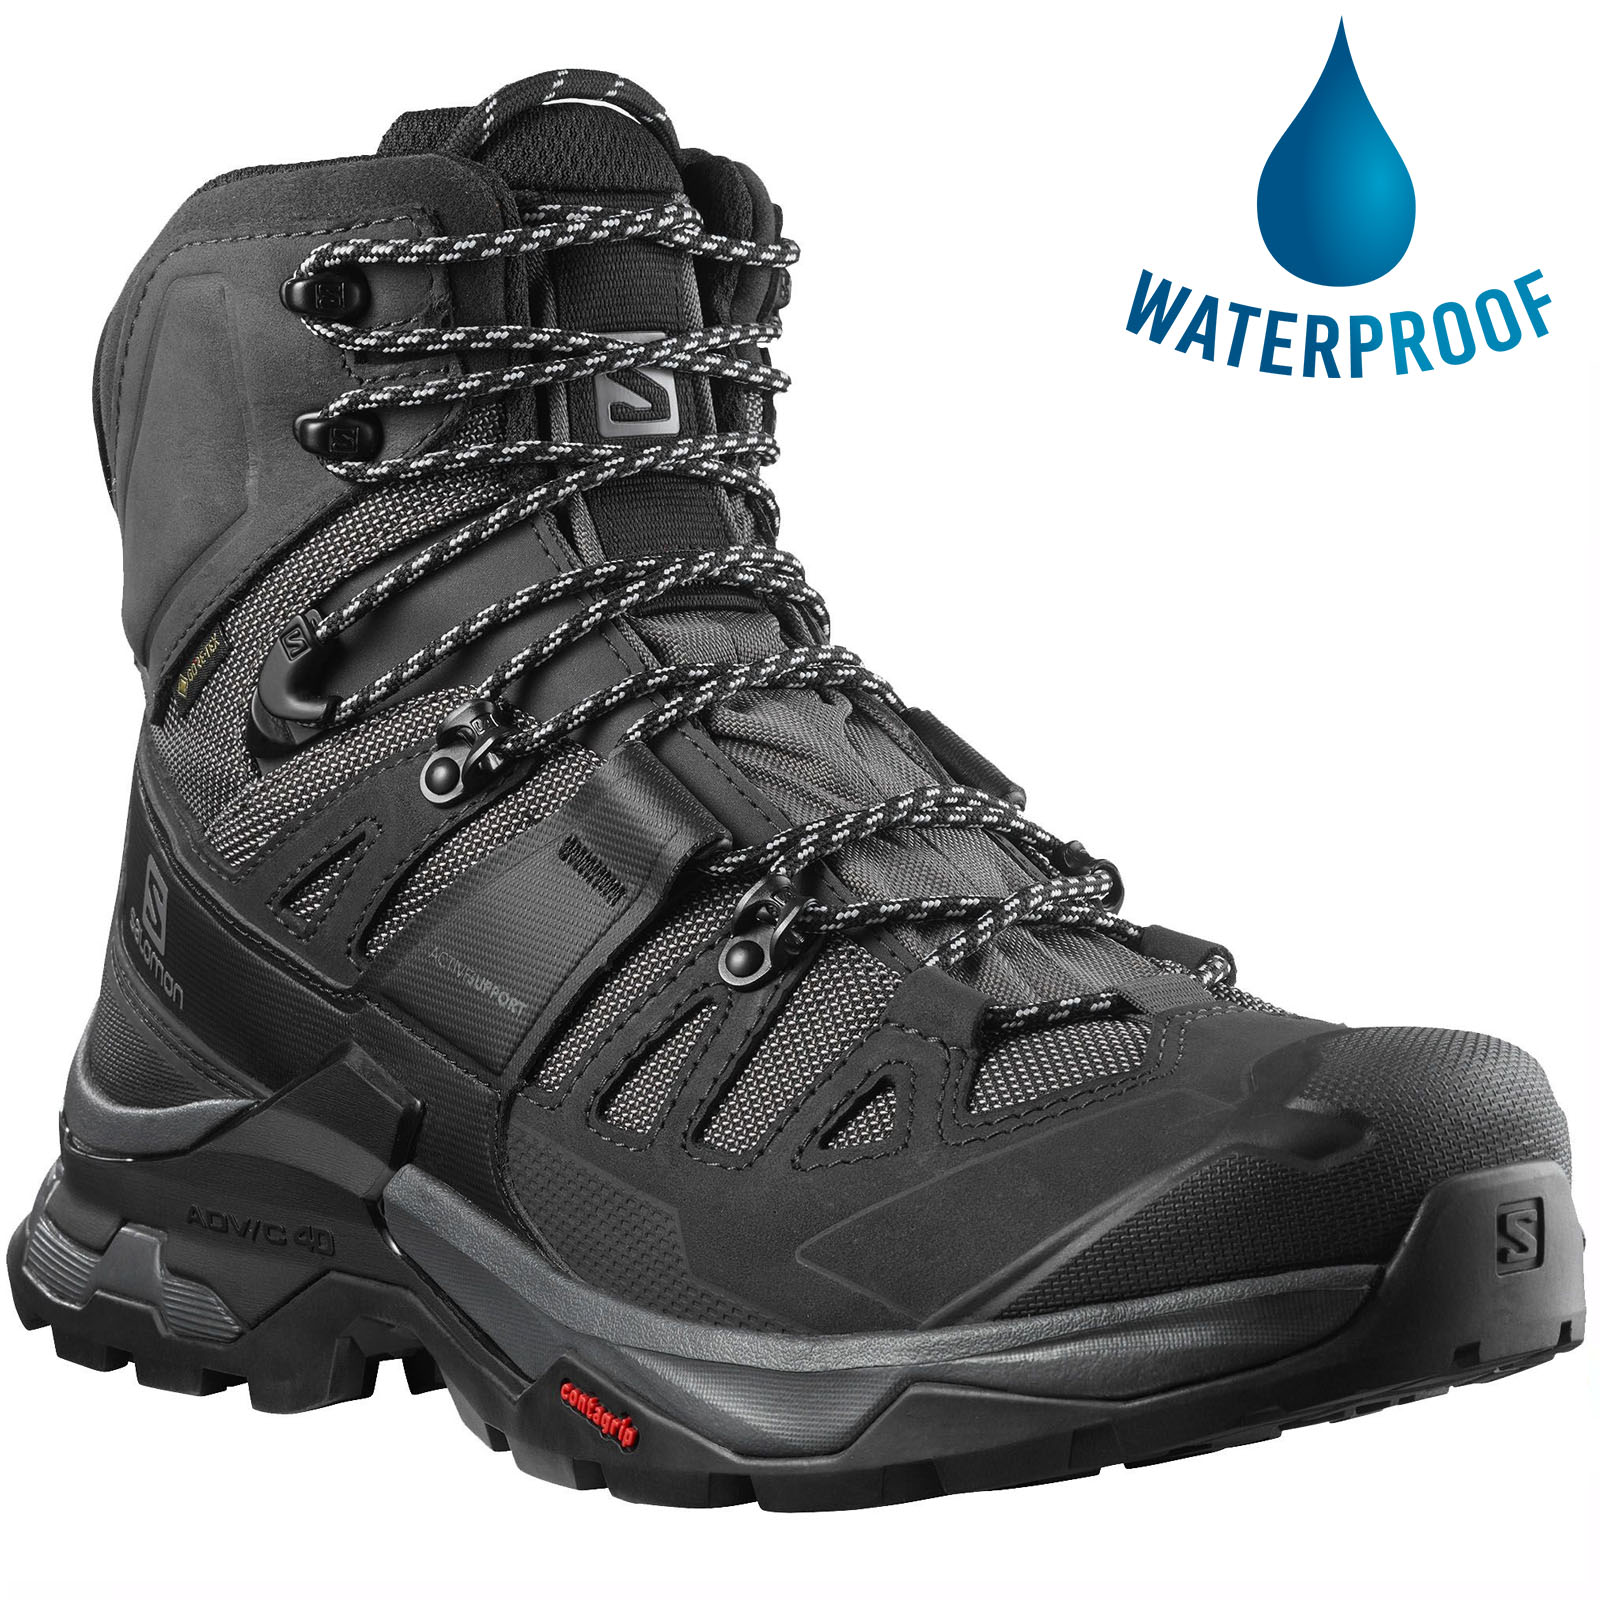 Salomon Mens Quest 4 GTX Waterproof Walking Hiking Boots - Magnet Black Quarry